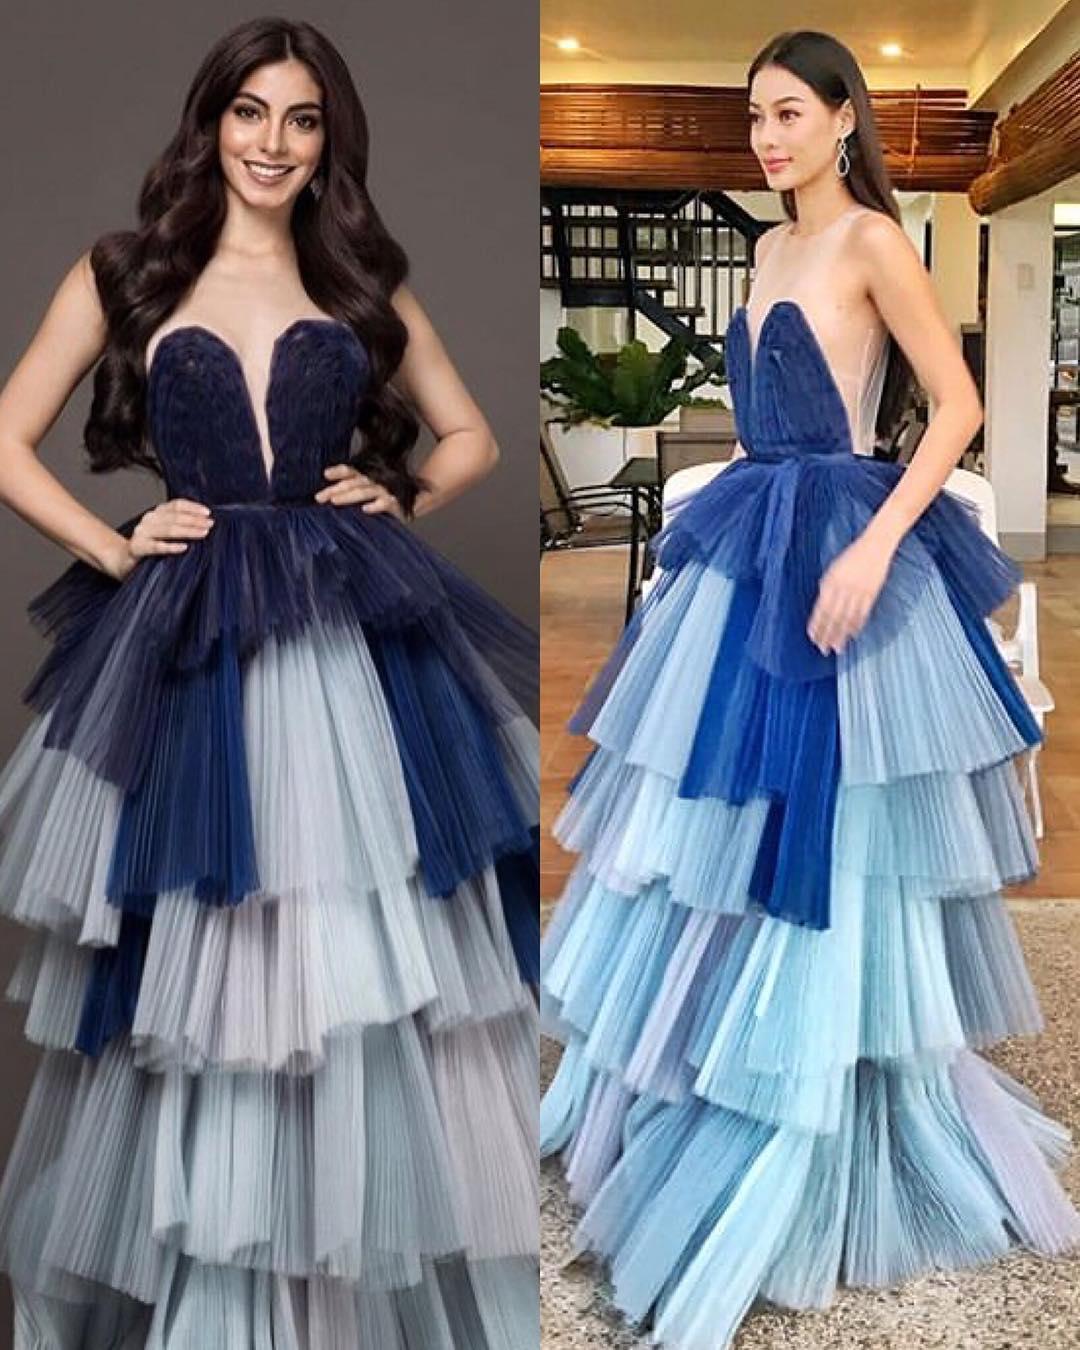 miss universe ecuador 2018 & miss supranational philippines 2018 usando vestido igual. Edre4g8p